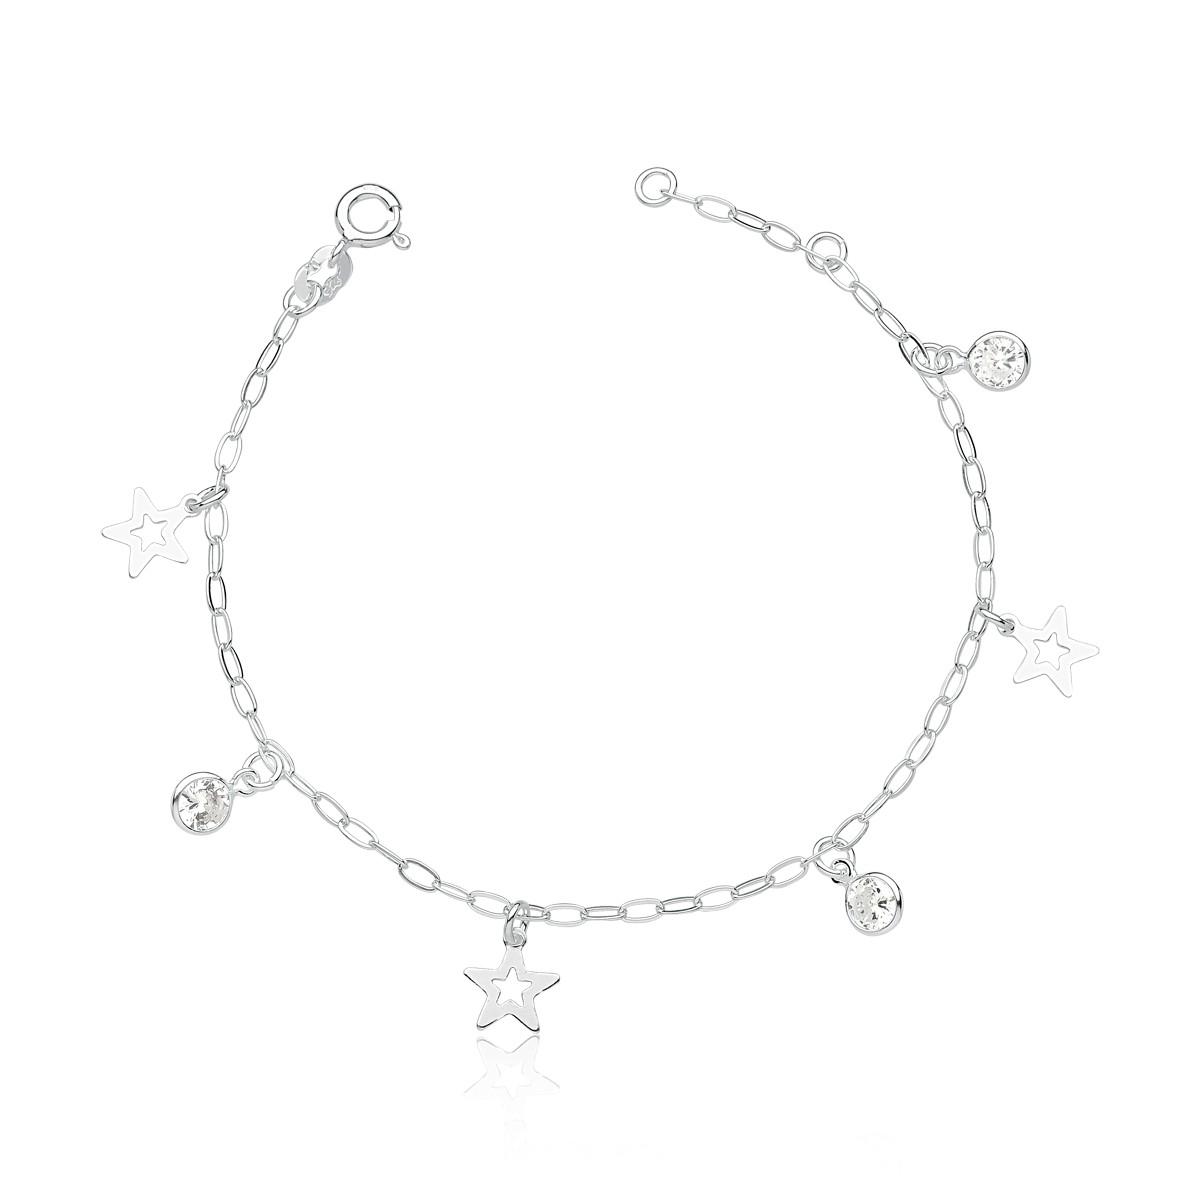 Pulseira Estrelas e Zircônias